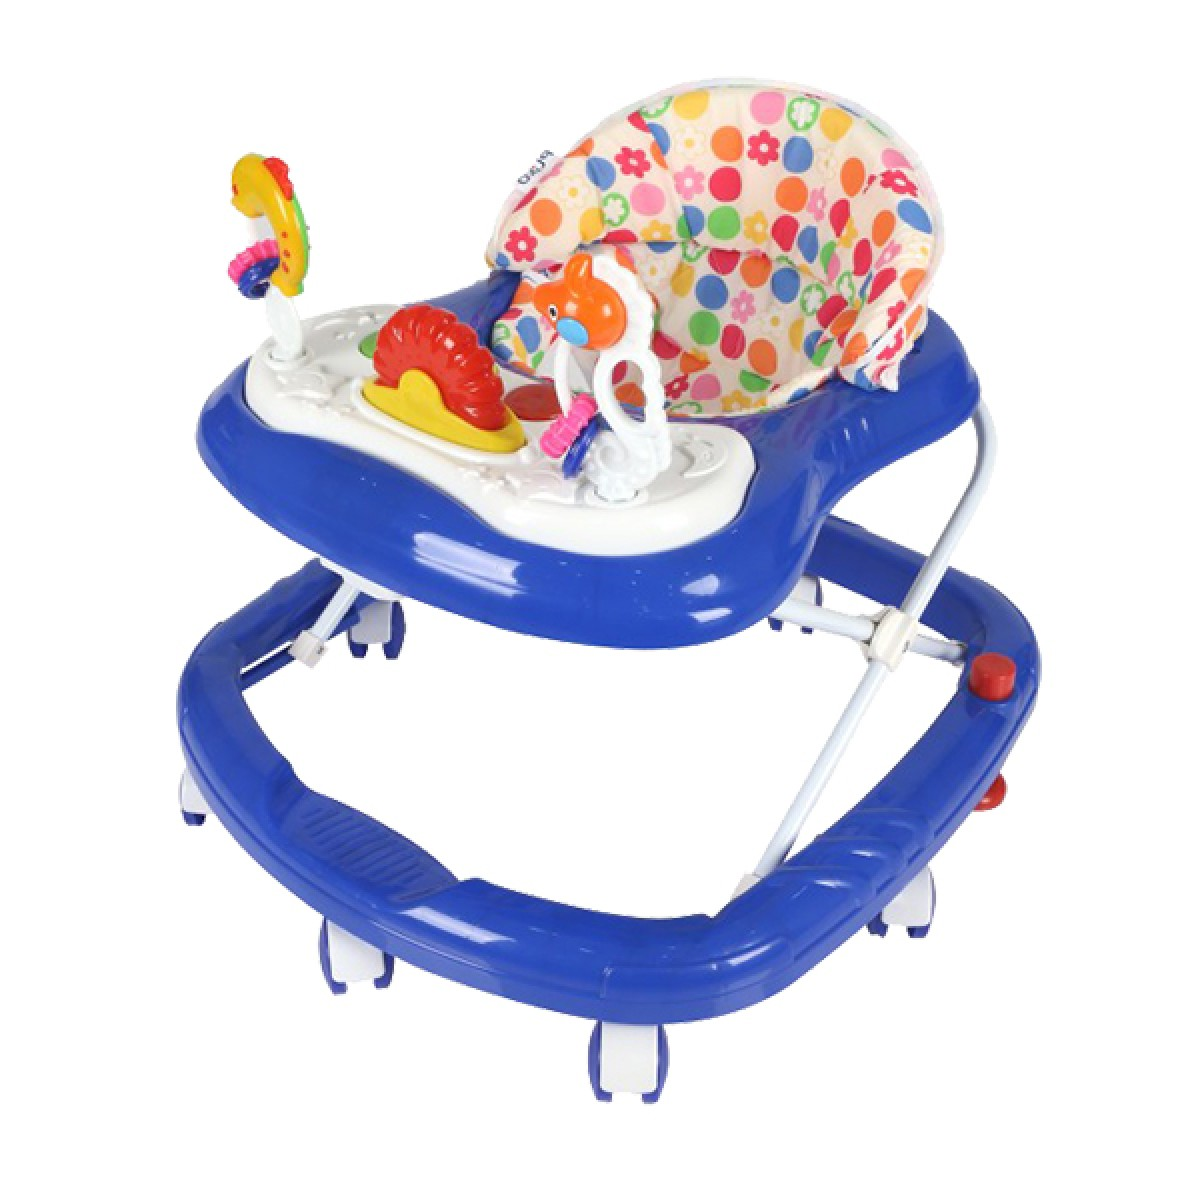 Sophie Baby Walker - Kico Baby Center